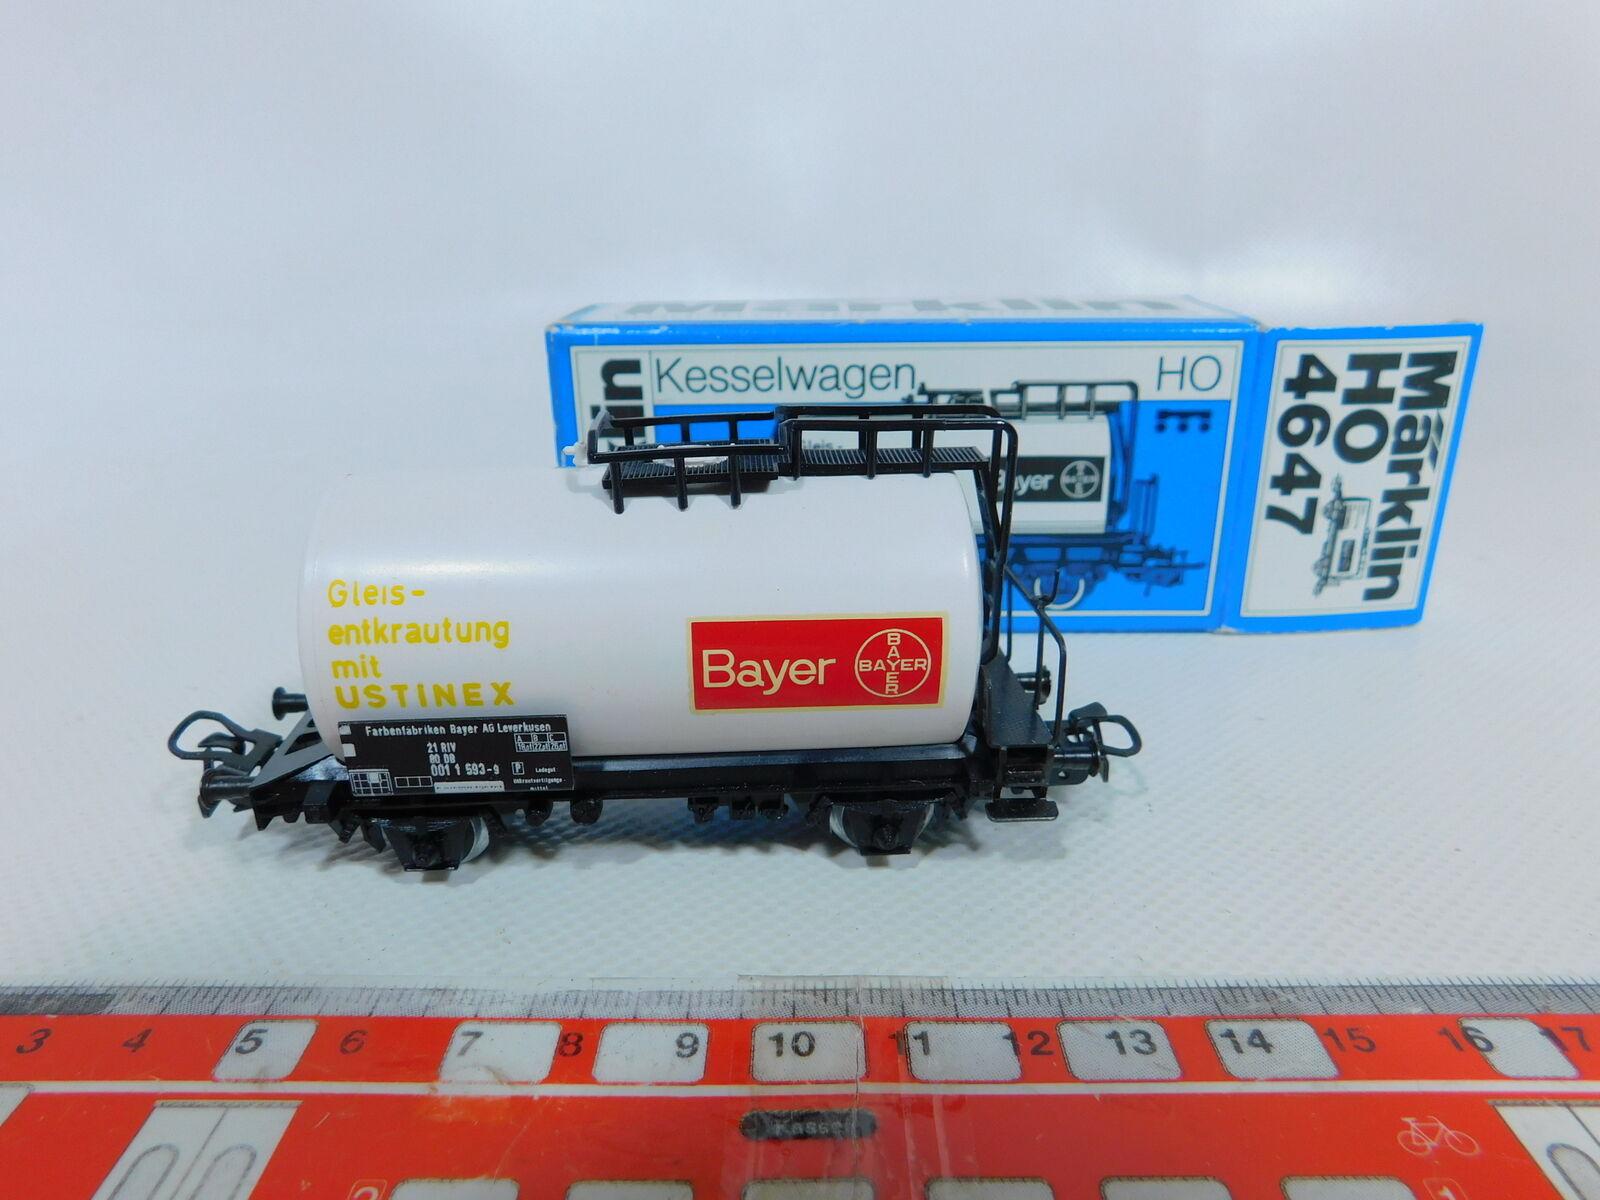 BZ681-0, 5  Märklin H0 AC 4647.1 Tank Cars Bayer ustinex DB Very Well, OVP